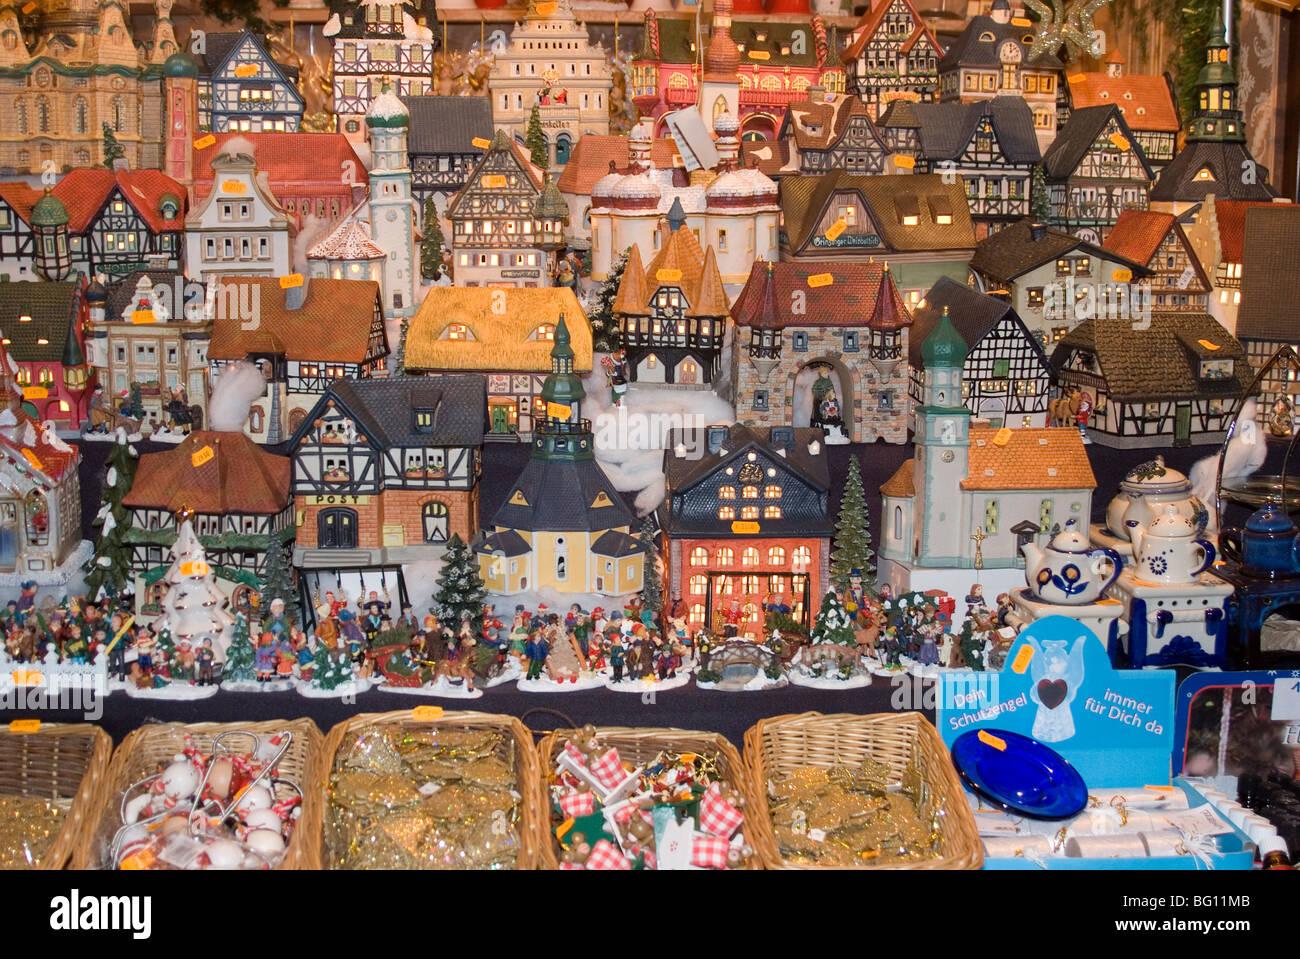 Ceramic houses, Weihnachtsmarkt (Children's Christmas Market), Nuremberg, Bavaria, Germany, Europe - Stock Image